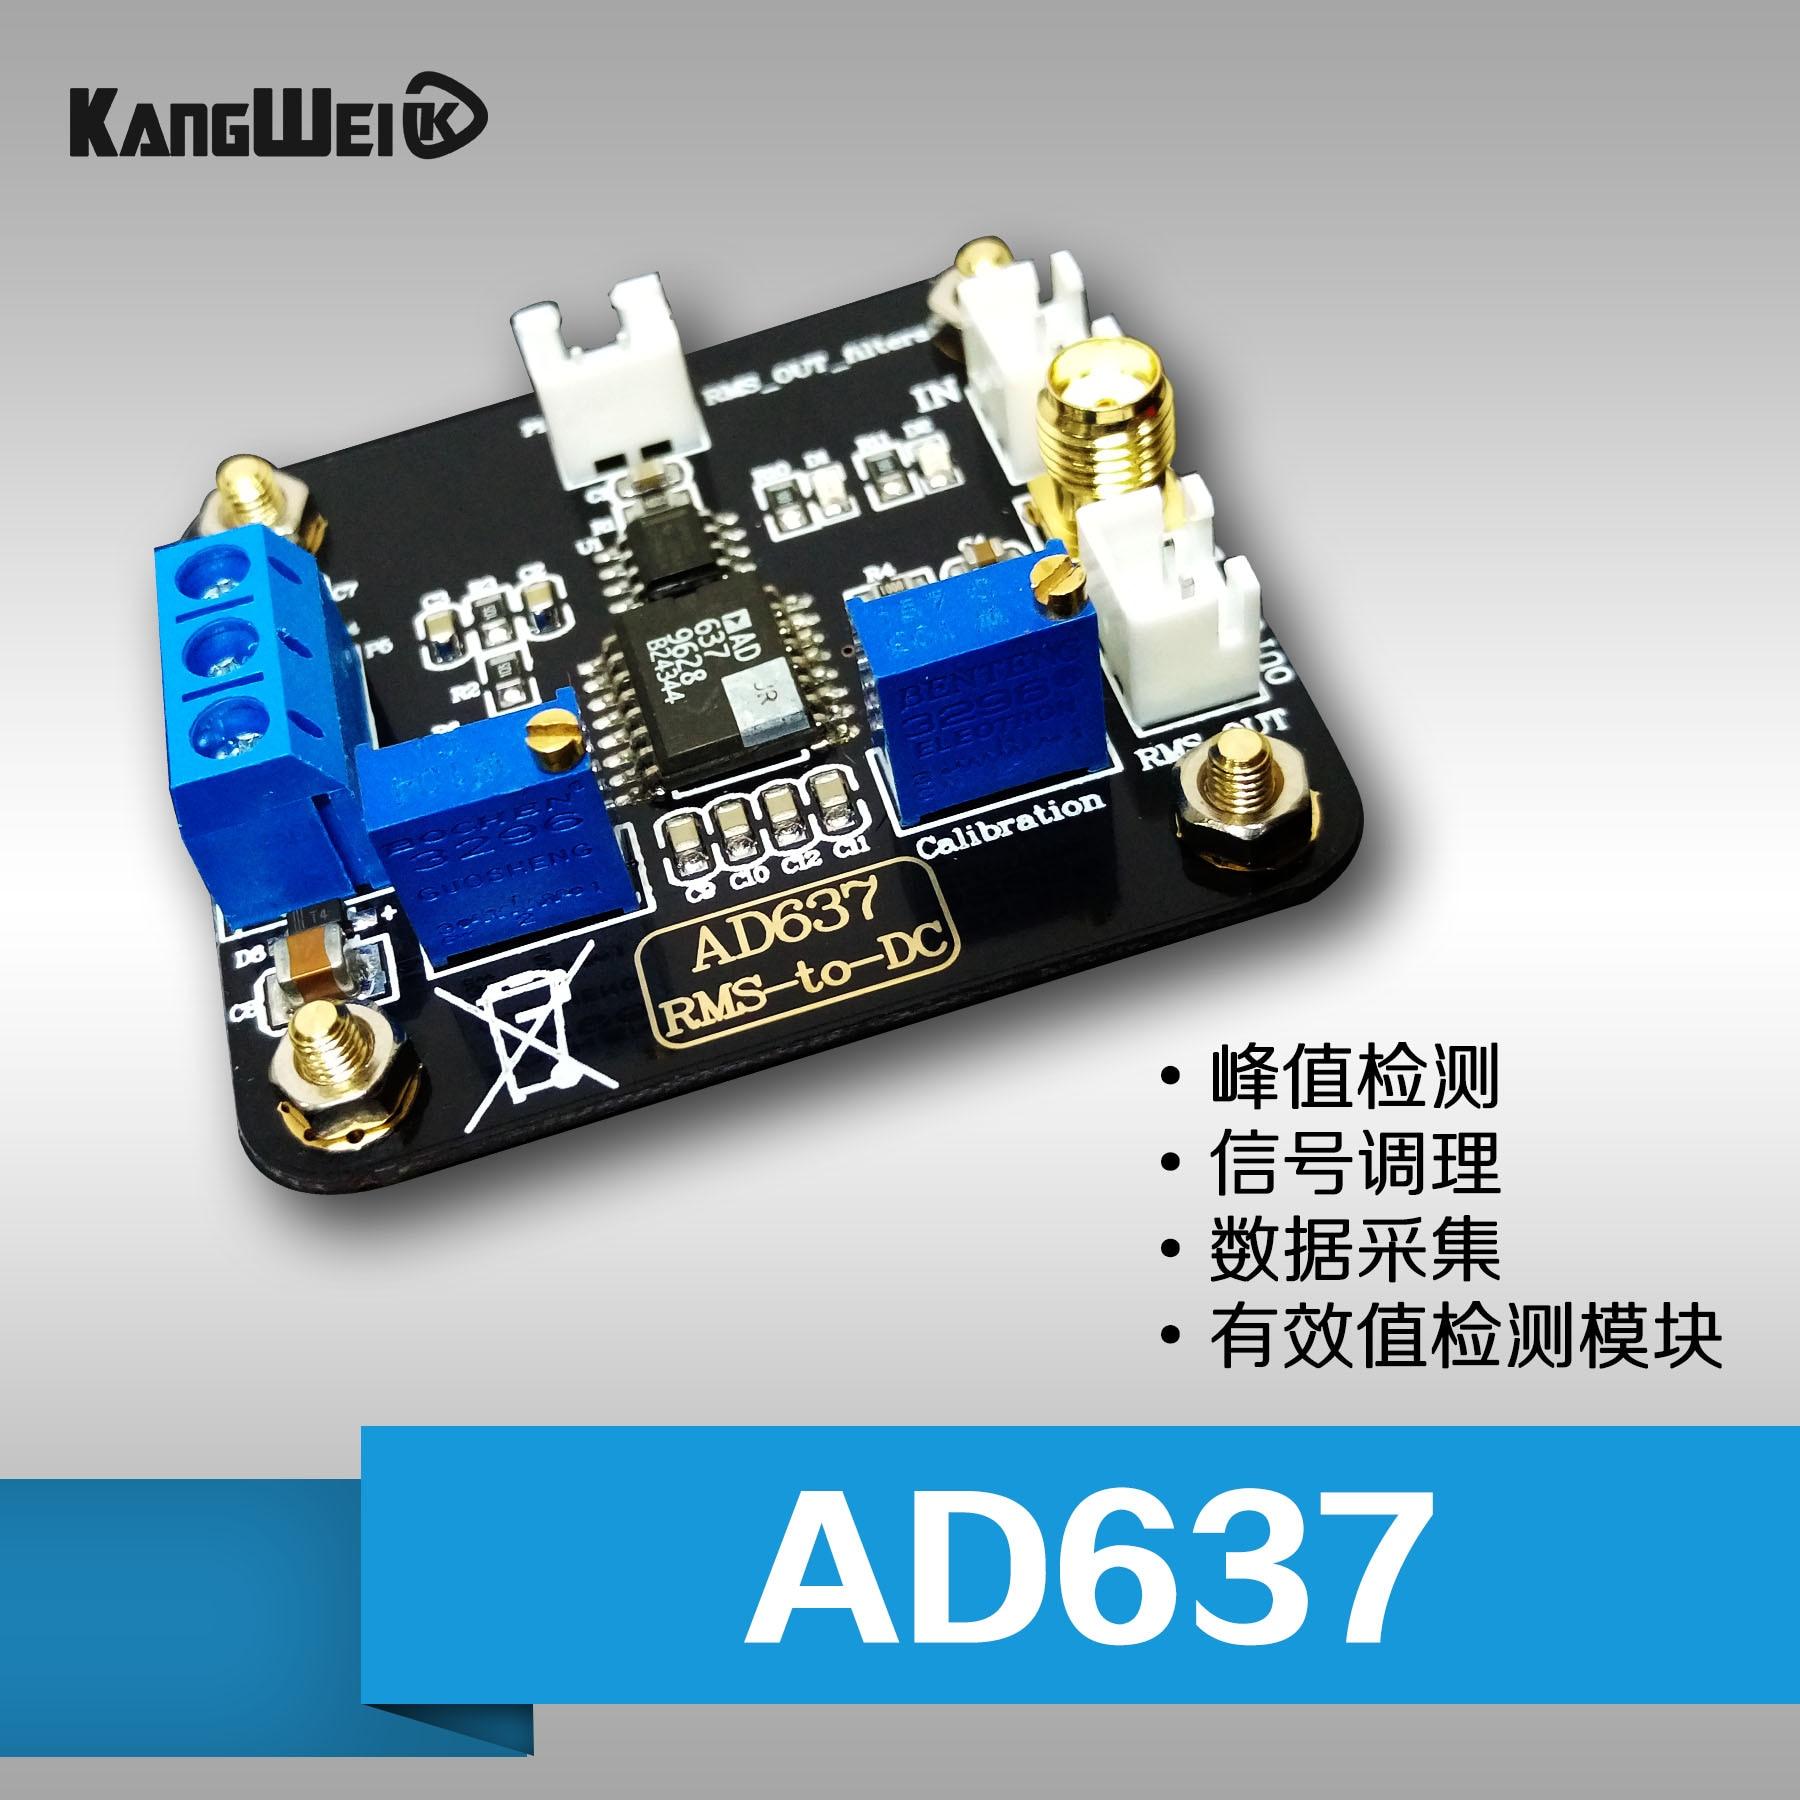 AD637 module effective value detection module peak detection signal conditioning data acquisition peak module